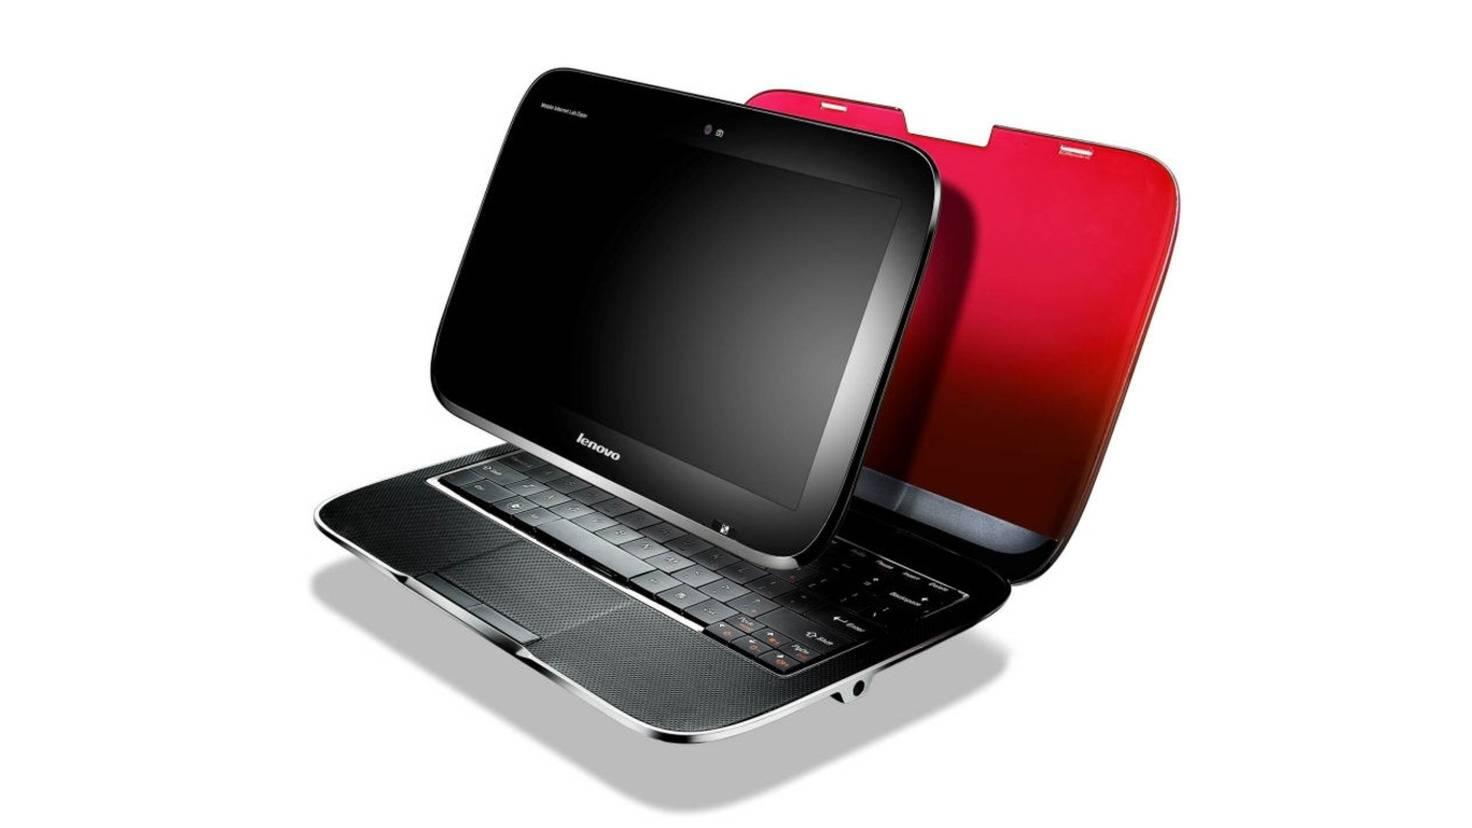 Lenovo-IdeaPad-U1-Hybrid